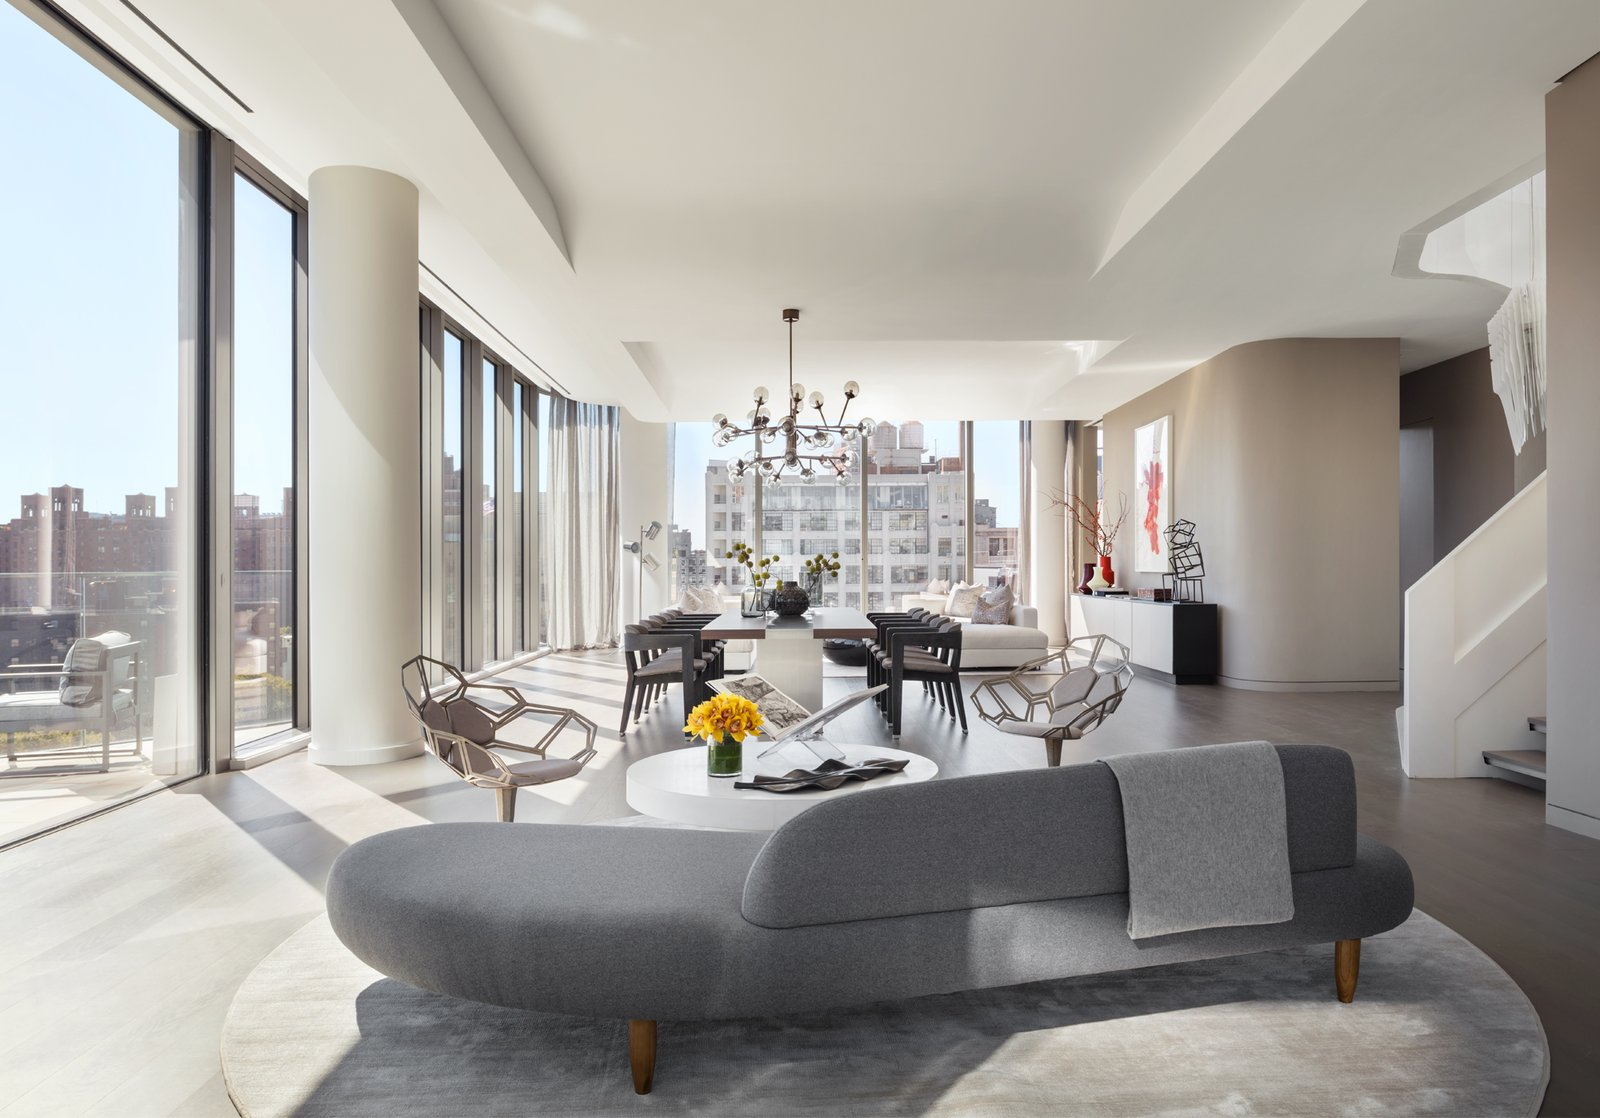 Zaha Hadid New York Penthouse living area